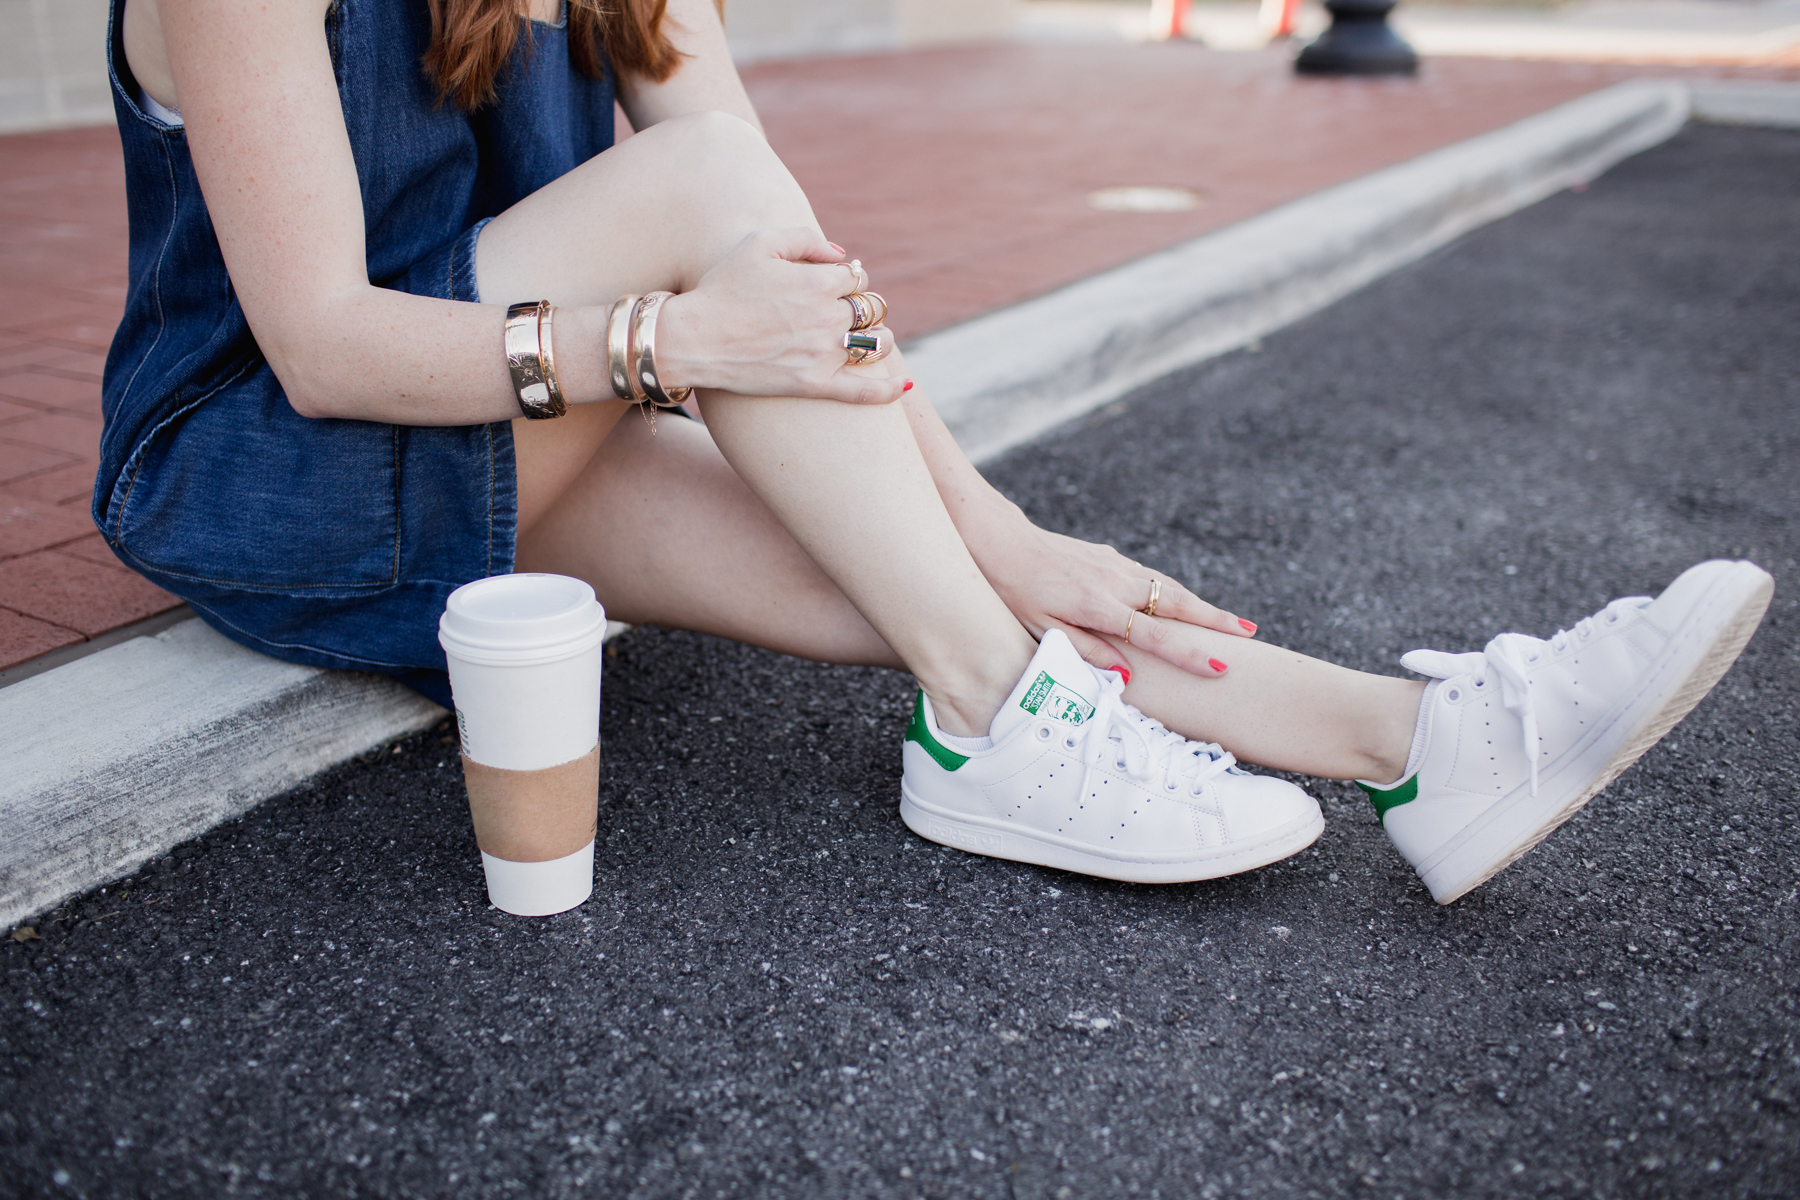 anna_e_cottrell_eldridge_edit_fashion_blogger_mgb_photo_denim_dress_summer_2016_trends_adidas_stan_smith_vintage_jewelry_acne_aviator_sunglasses_coffee_1.jpg